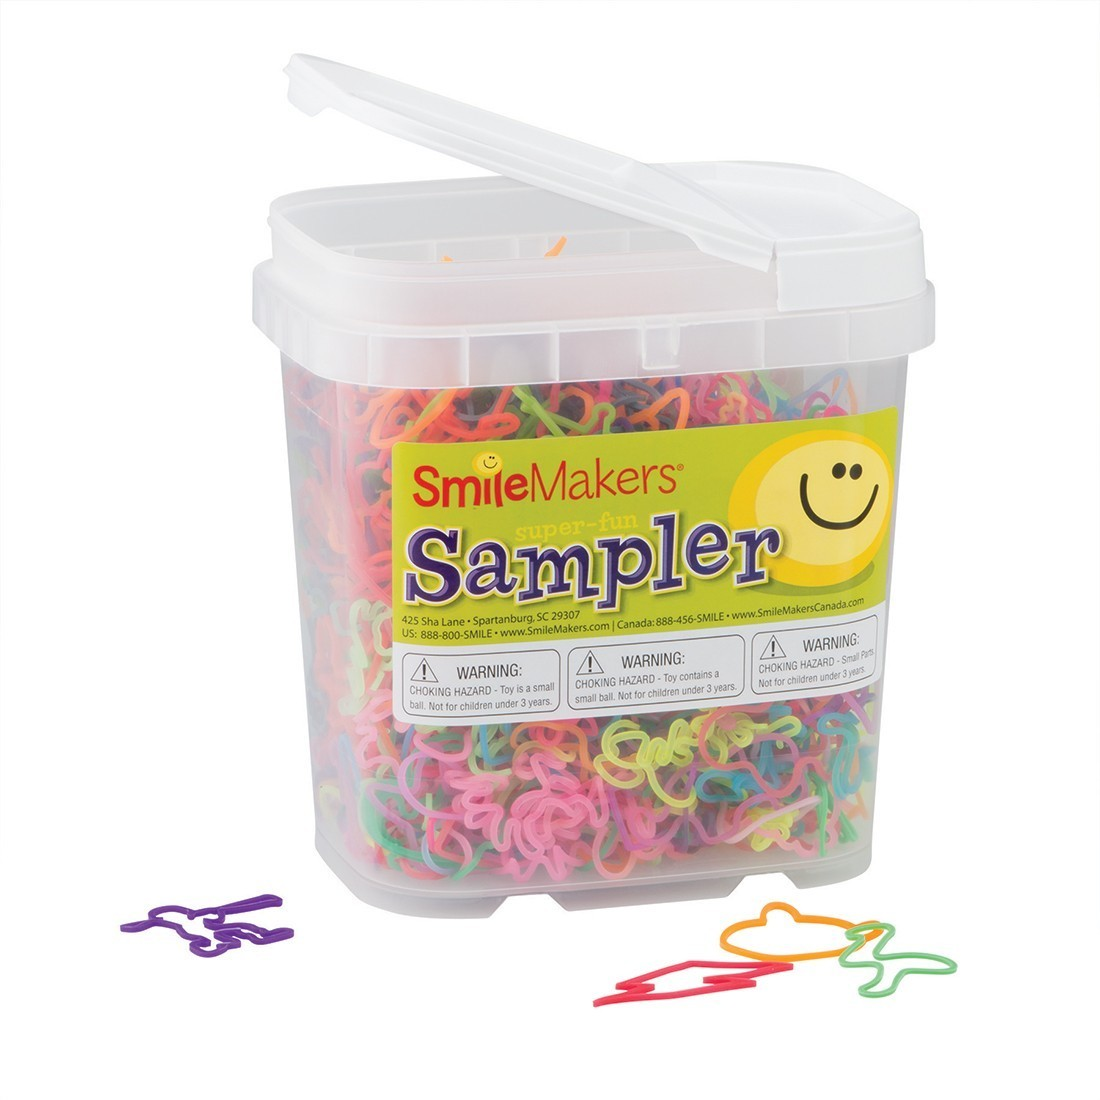 Smile Band Sampler [image]